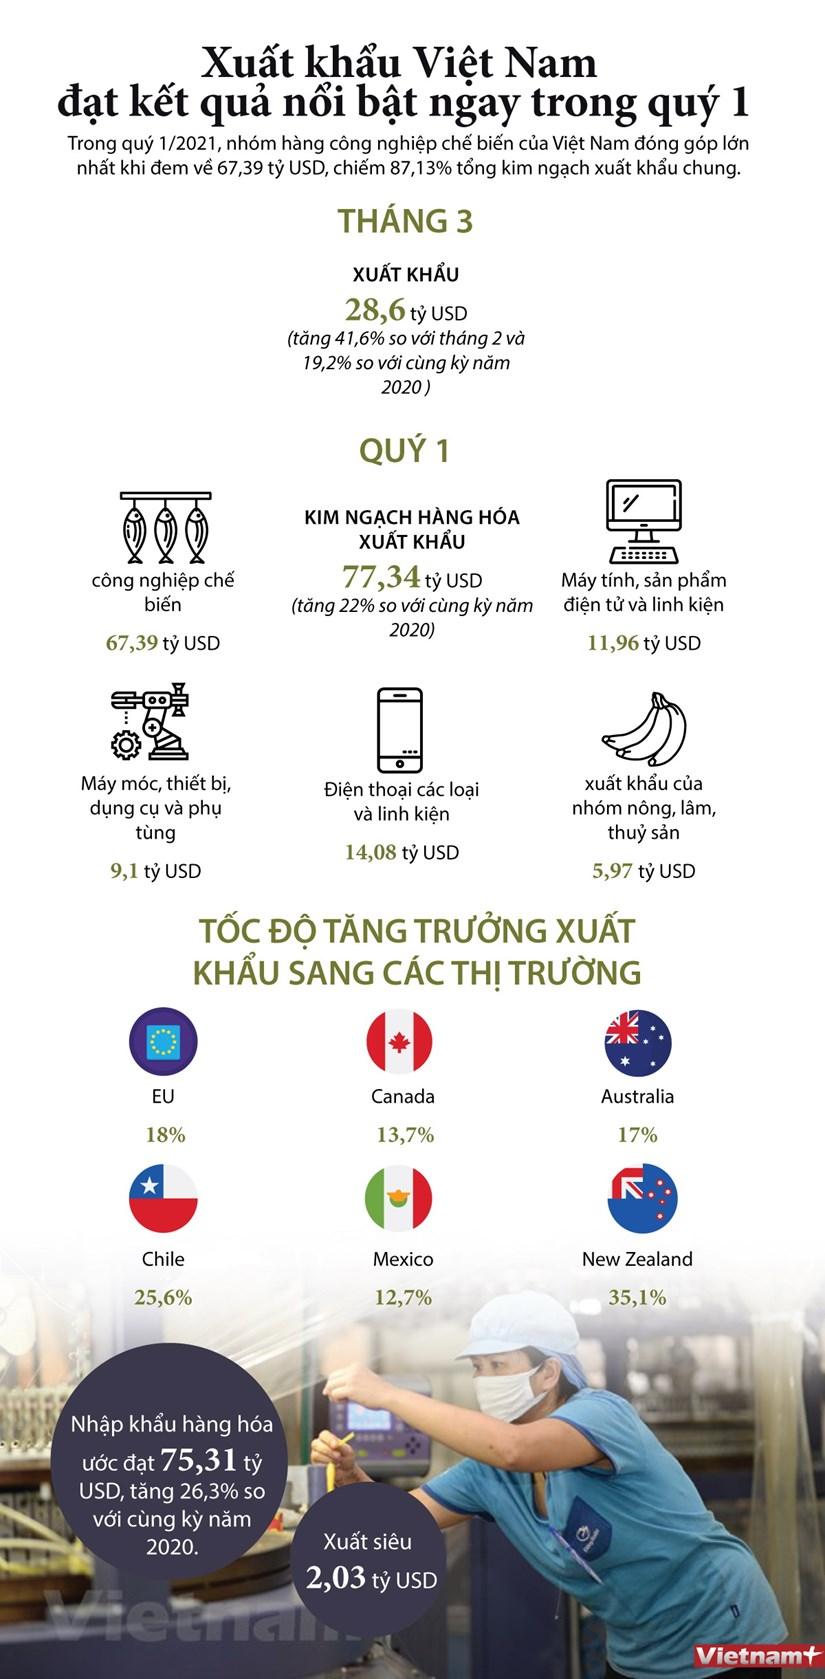 [Infographics] Xuat khau Viet Nam dat ket qua noi bat ngay trong quy 1 hinh anh 1